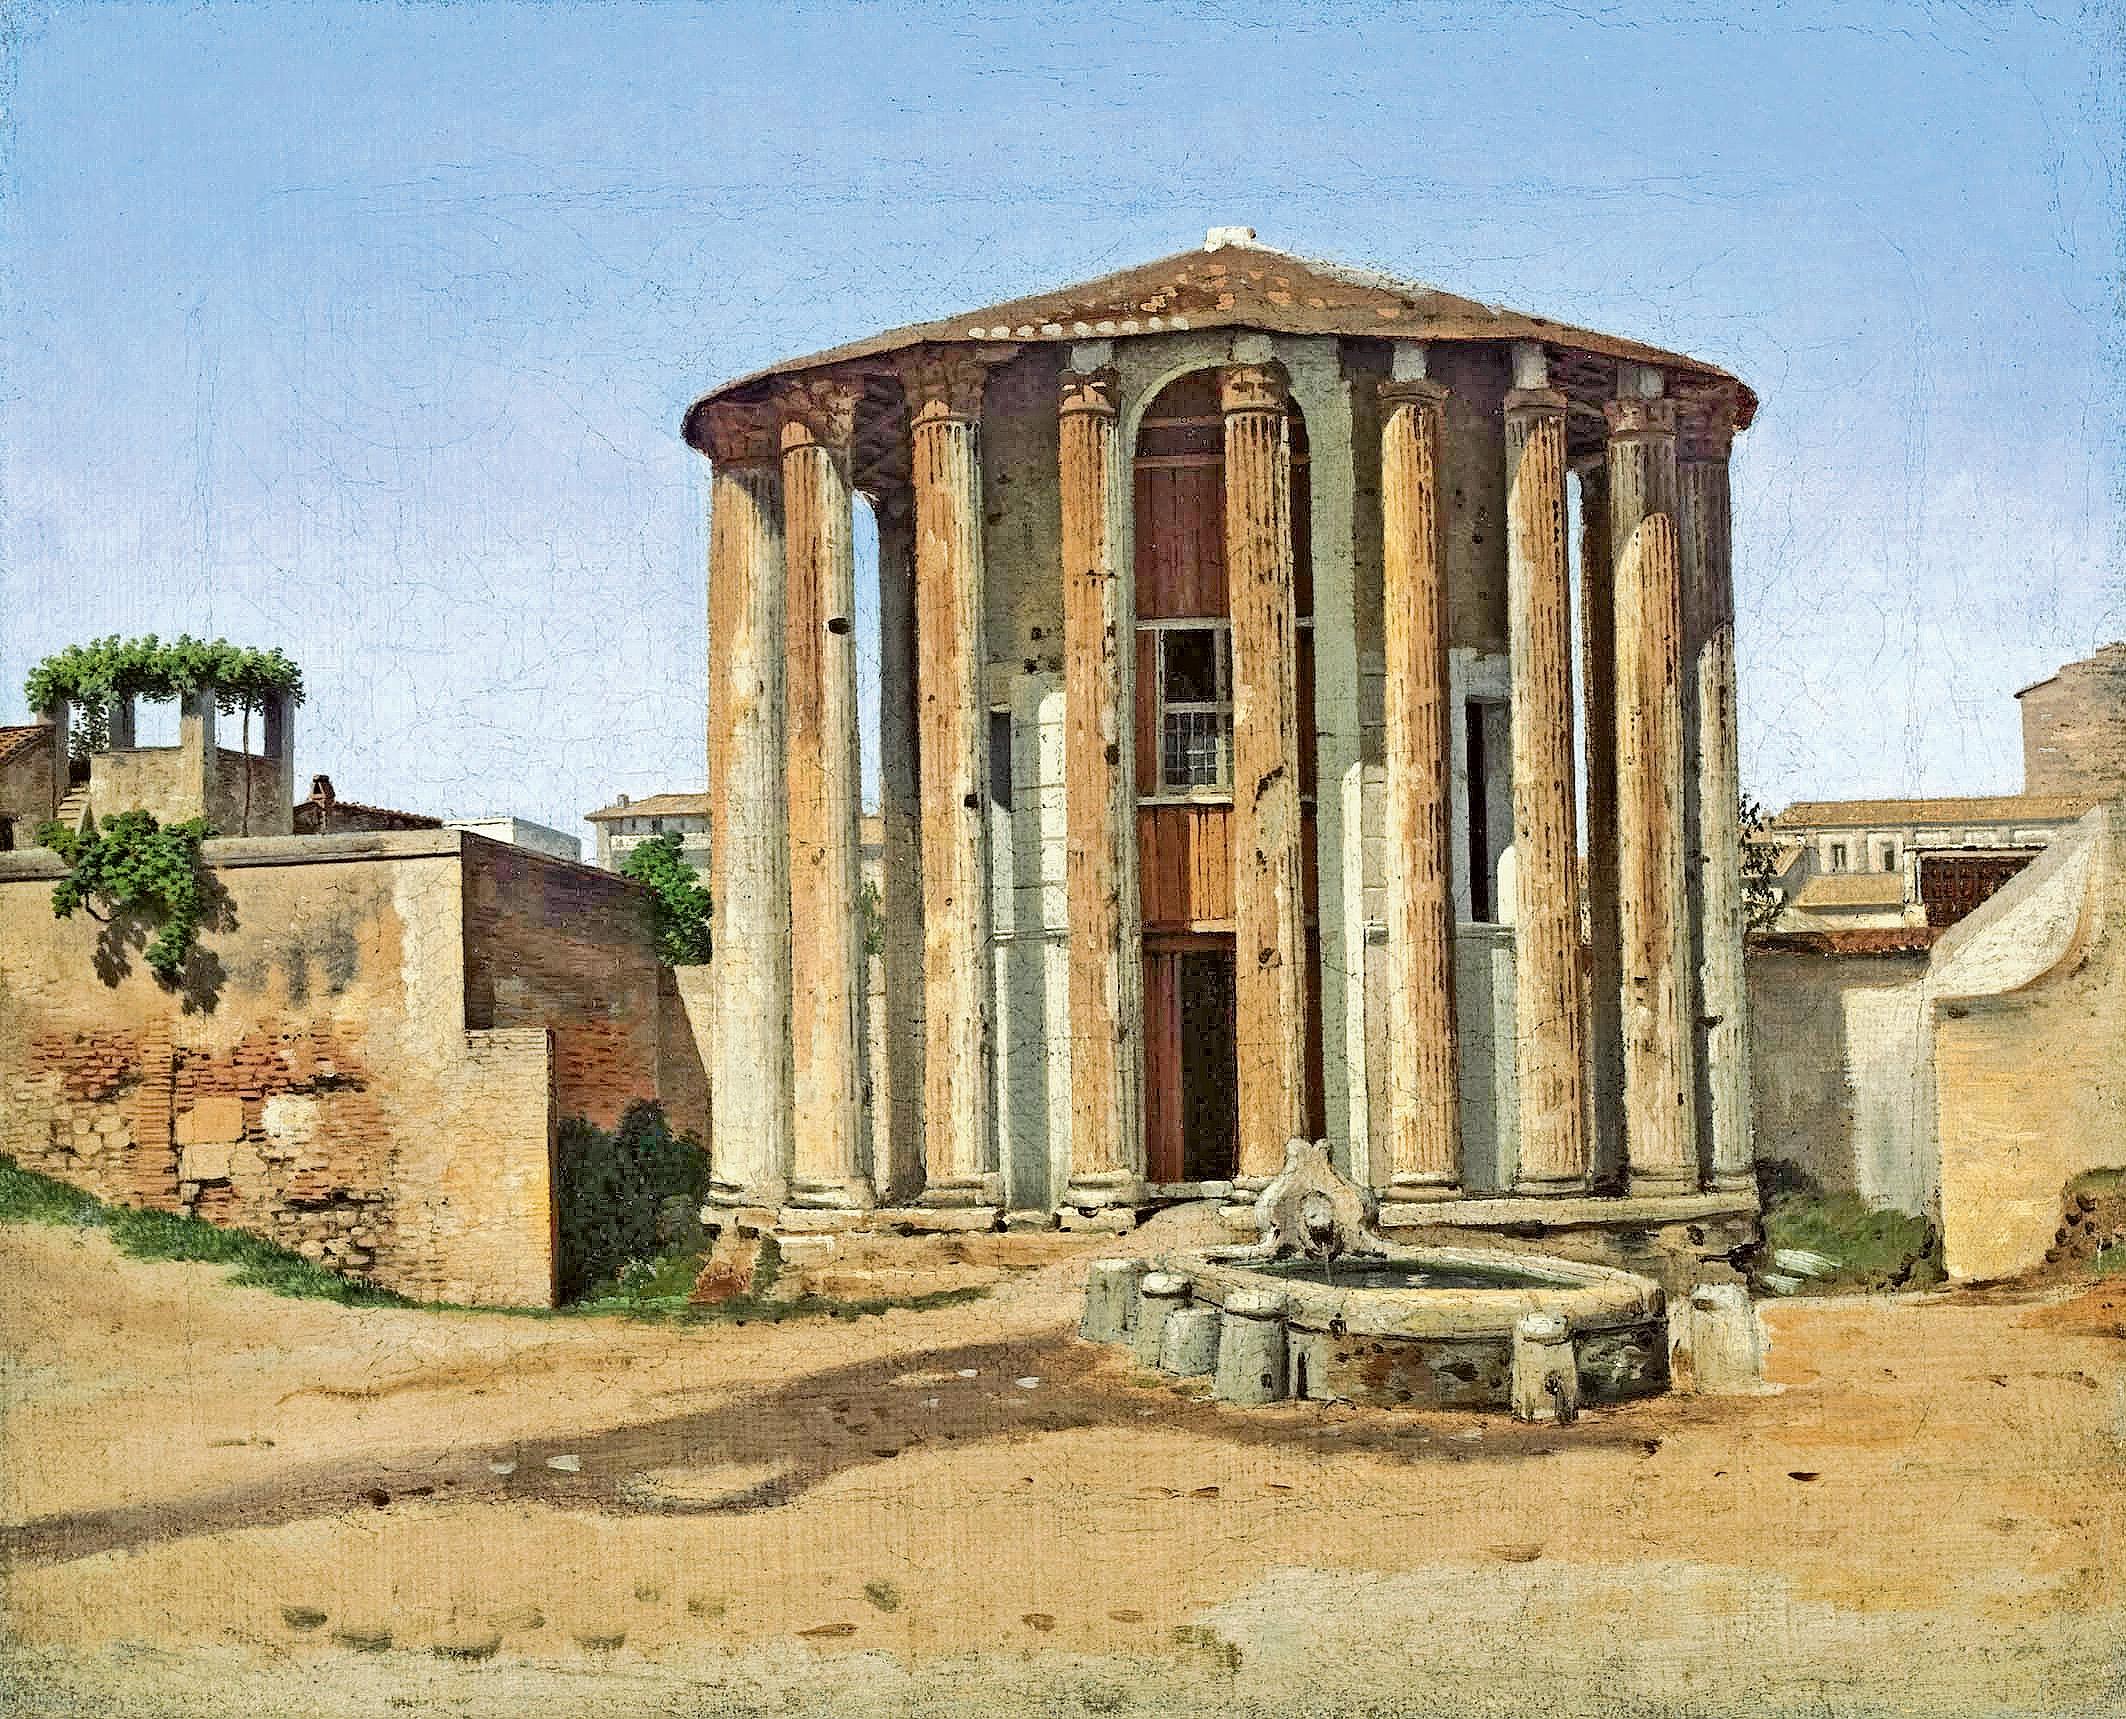 Maleri af C. W. Eckersberg, Vesta-templet i Rom, 1814-181. Nivaagaards Malerisamling.